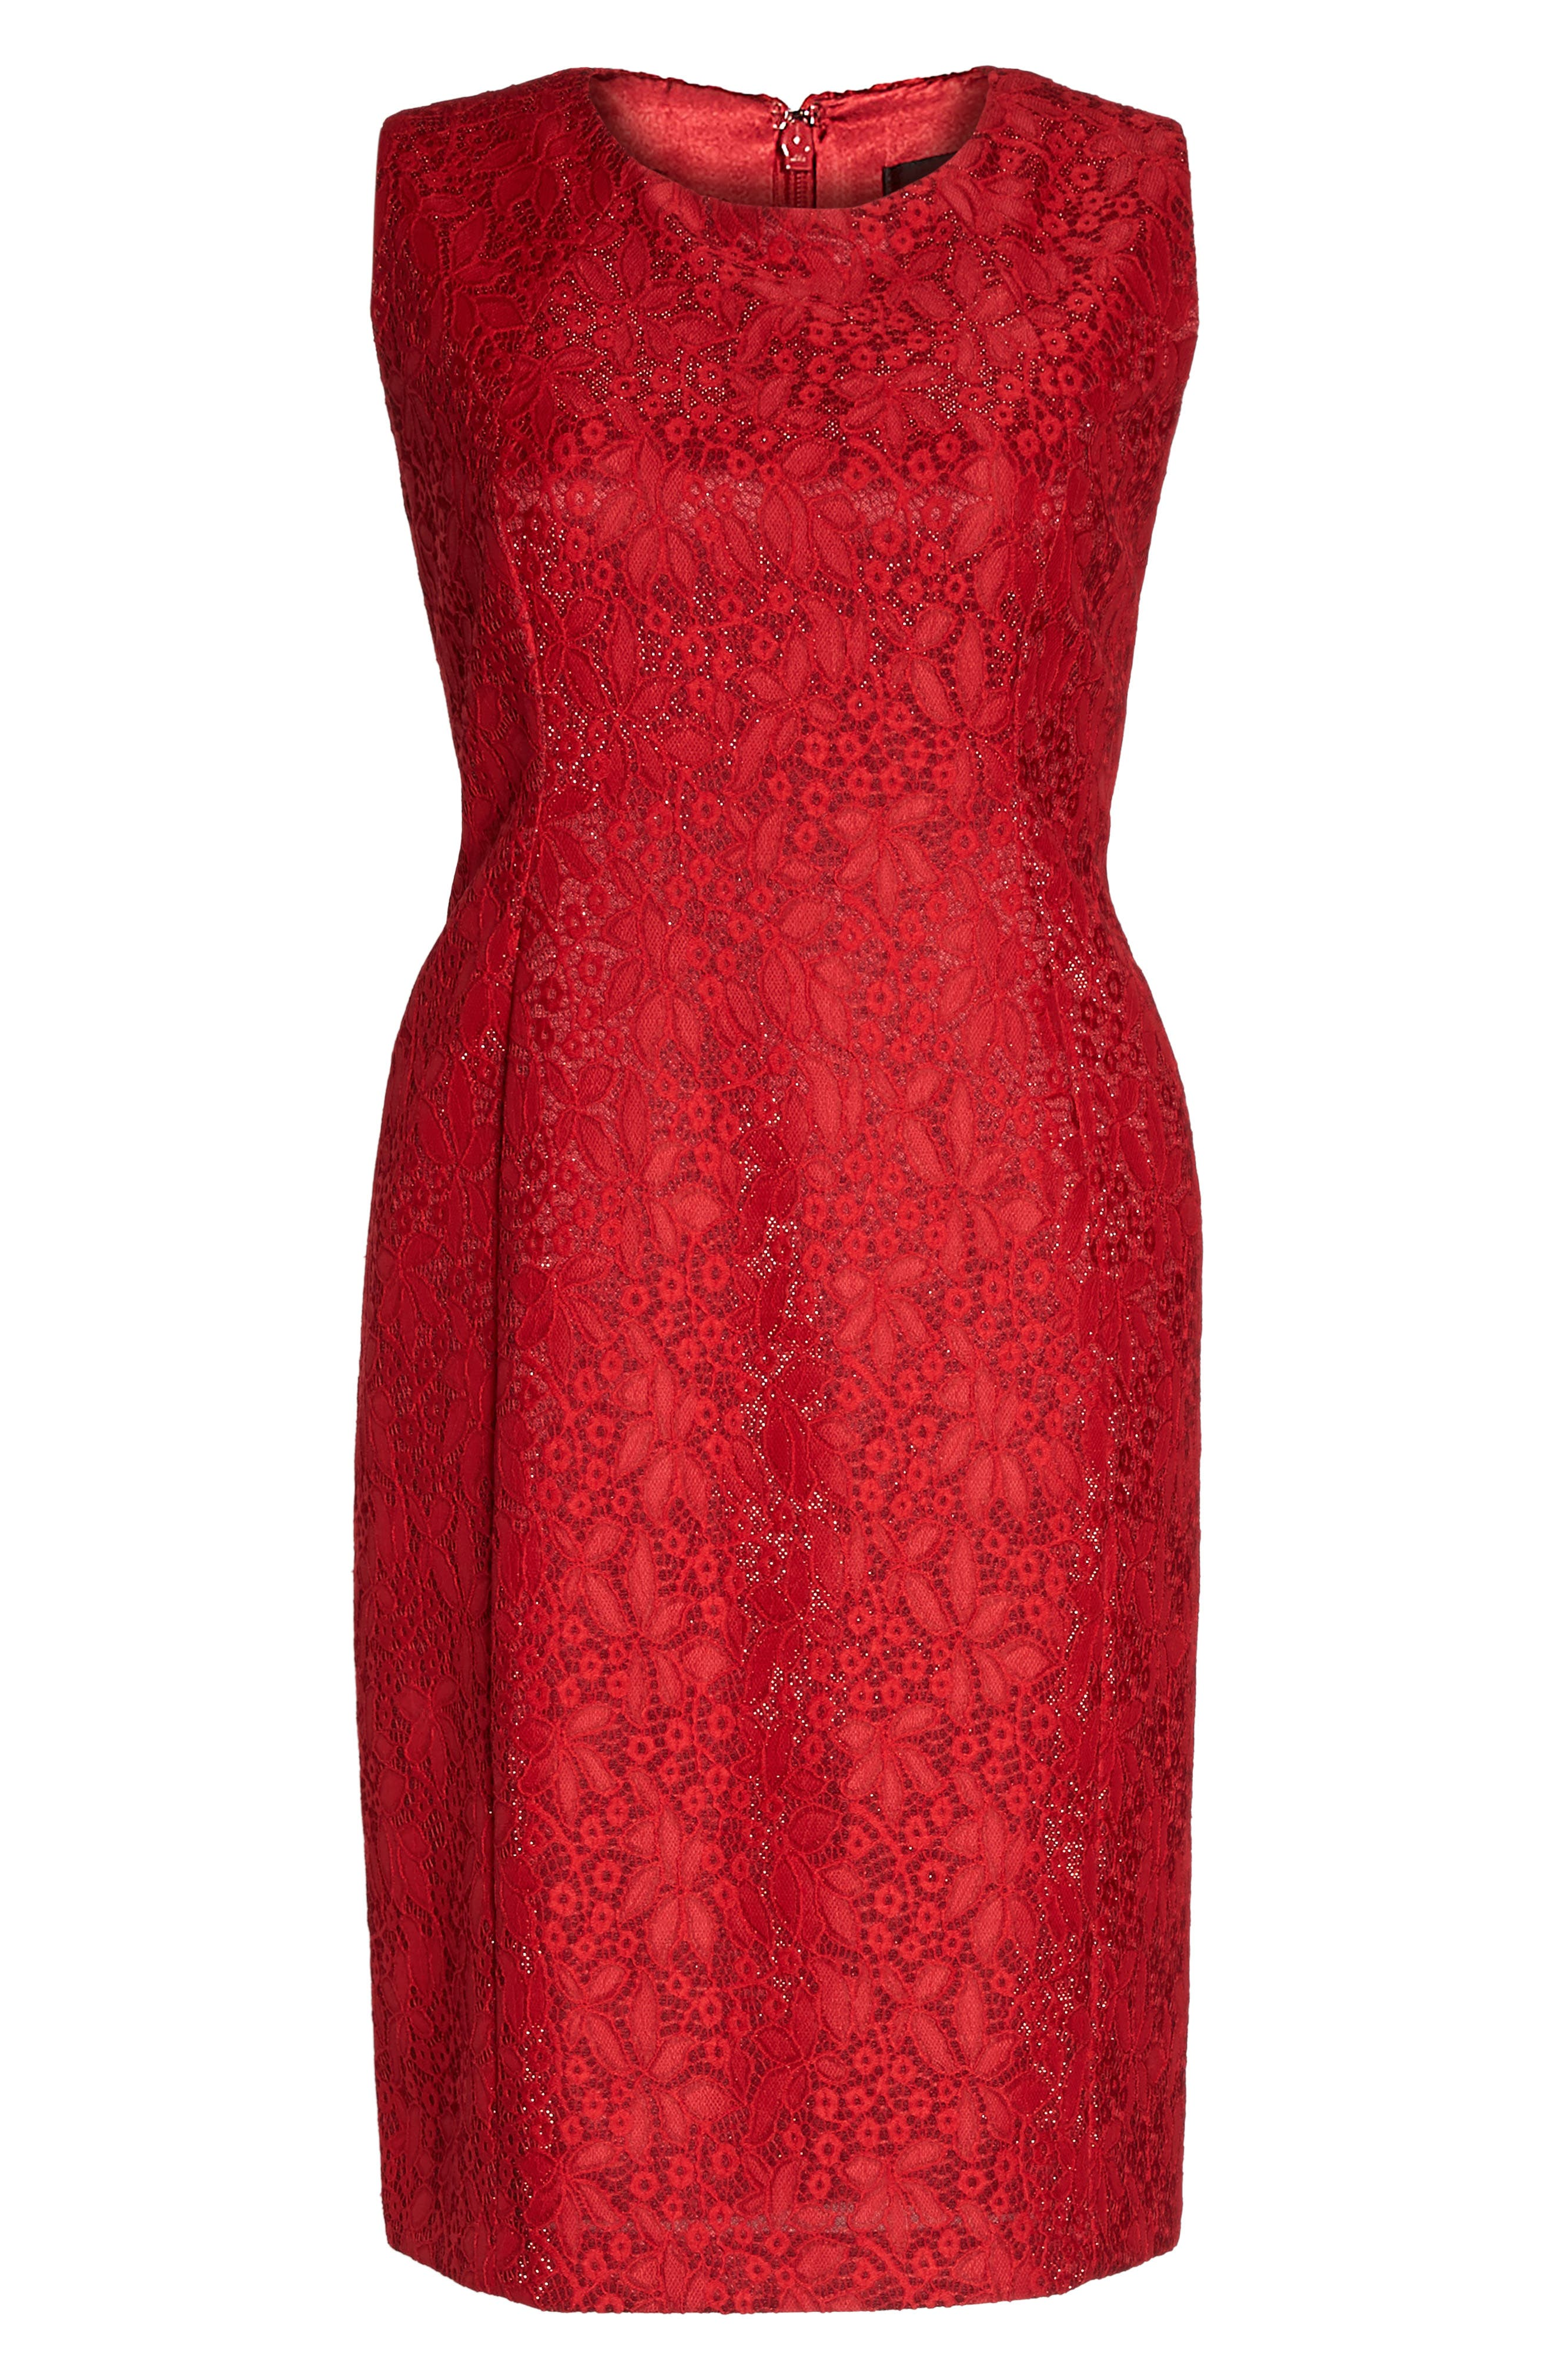 Shimmer Lace Sheath Dress,                             Alternate thumbnail 6, color,                             620